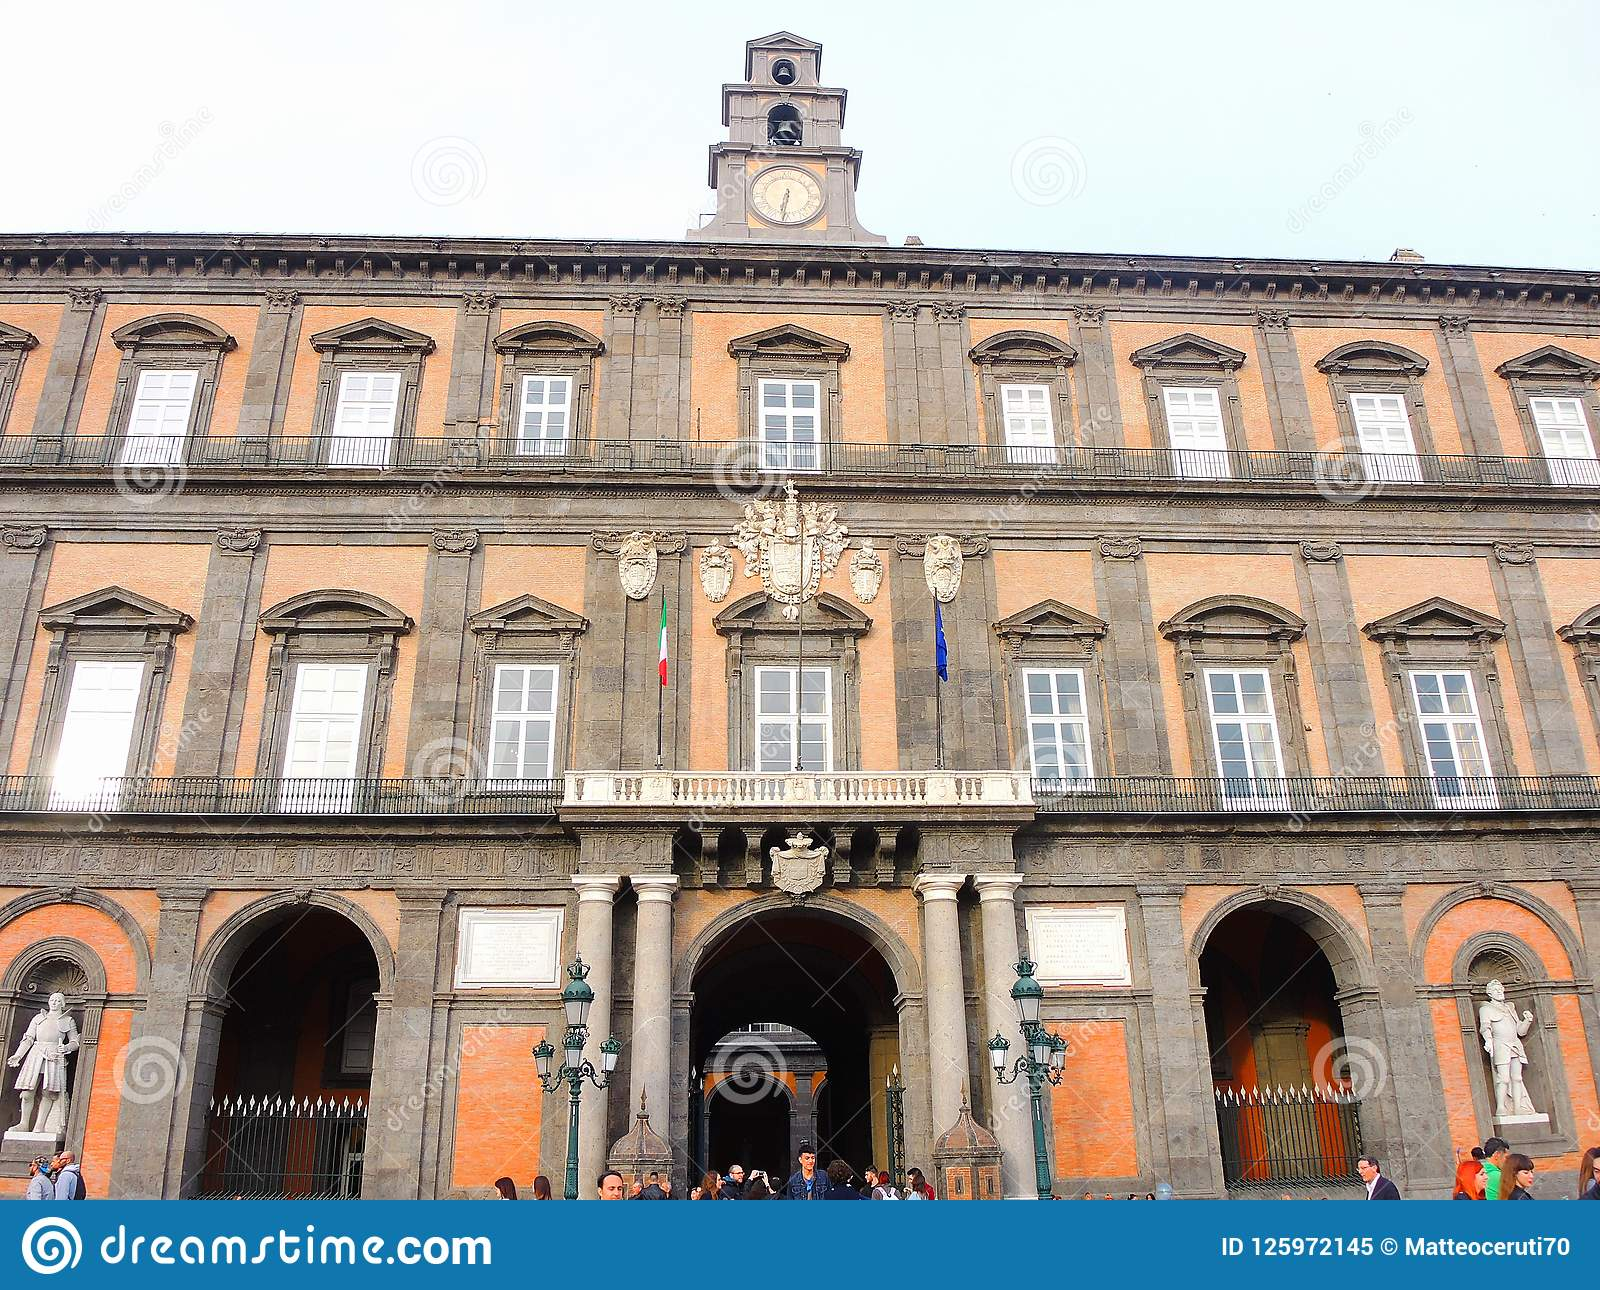 Napoli της Ιταλίας Τοπίο στη διάσημη Royal Palace της Νάπολης